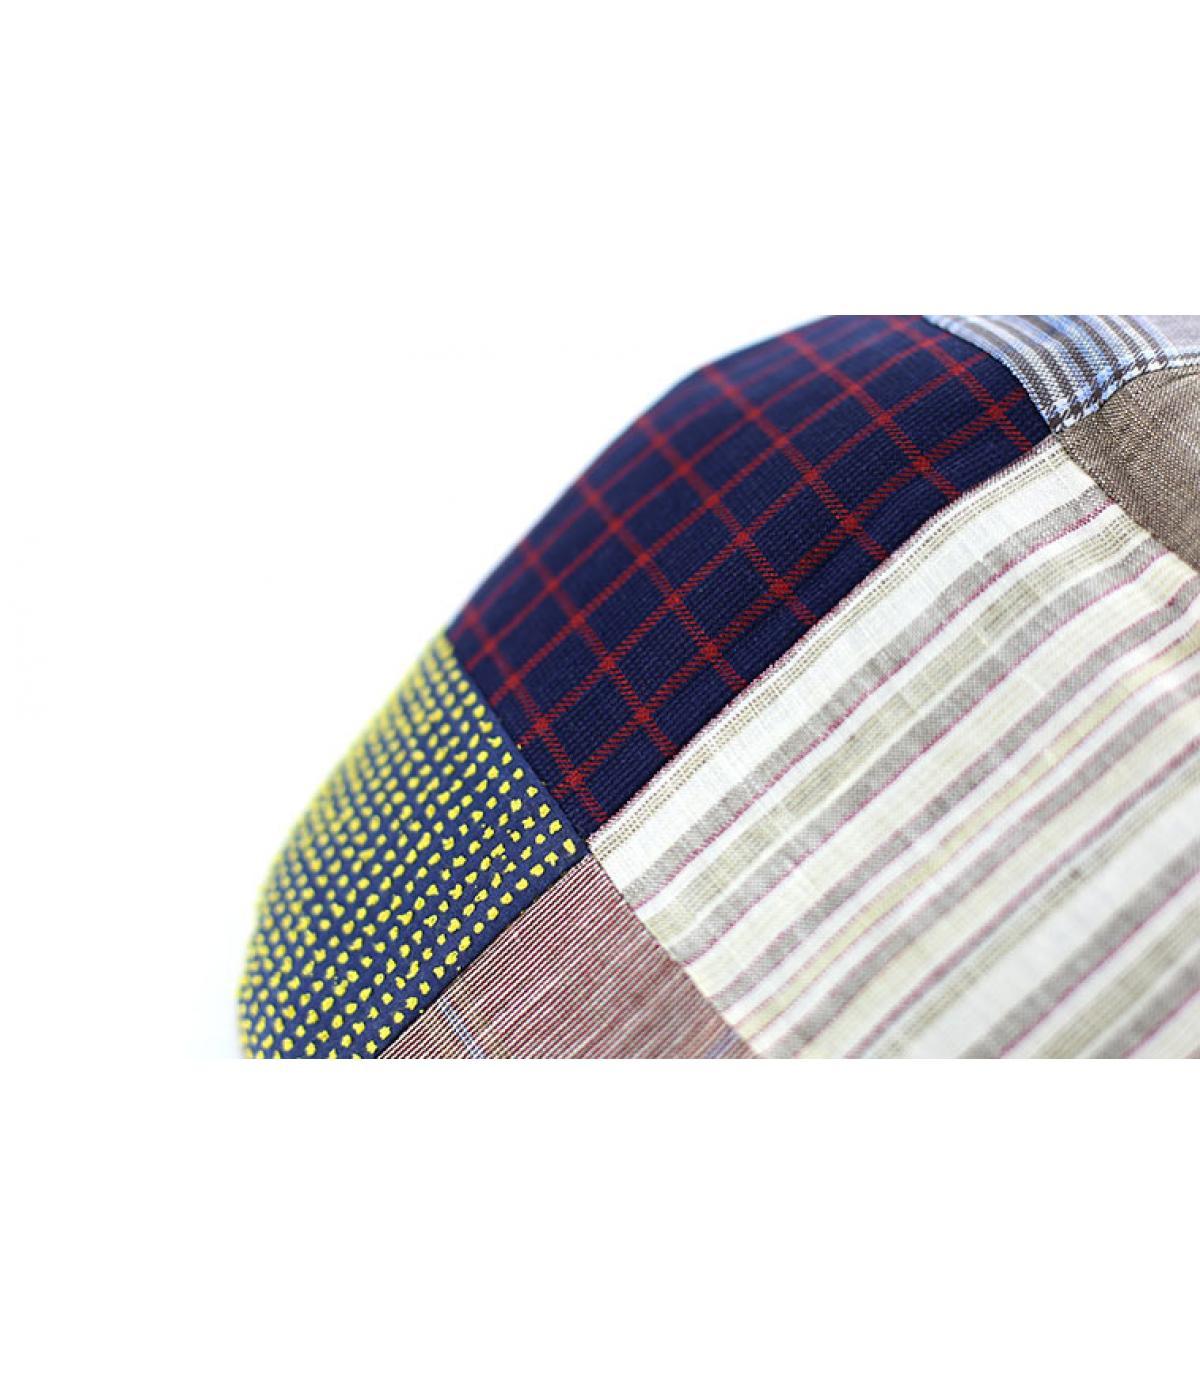 Dettagli Boxer patchwork - image 4